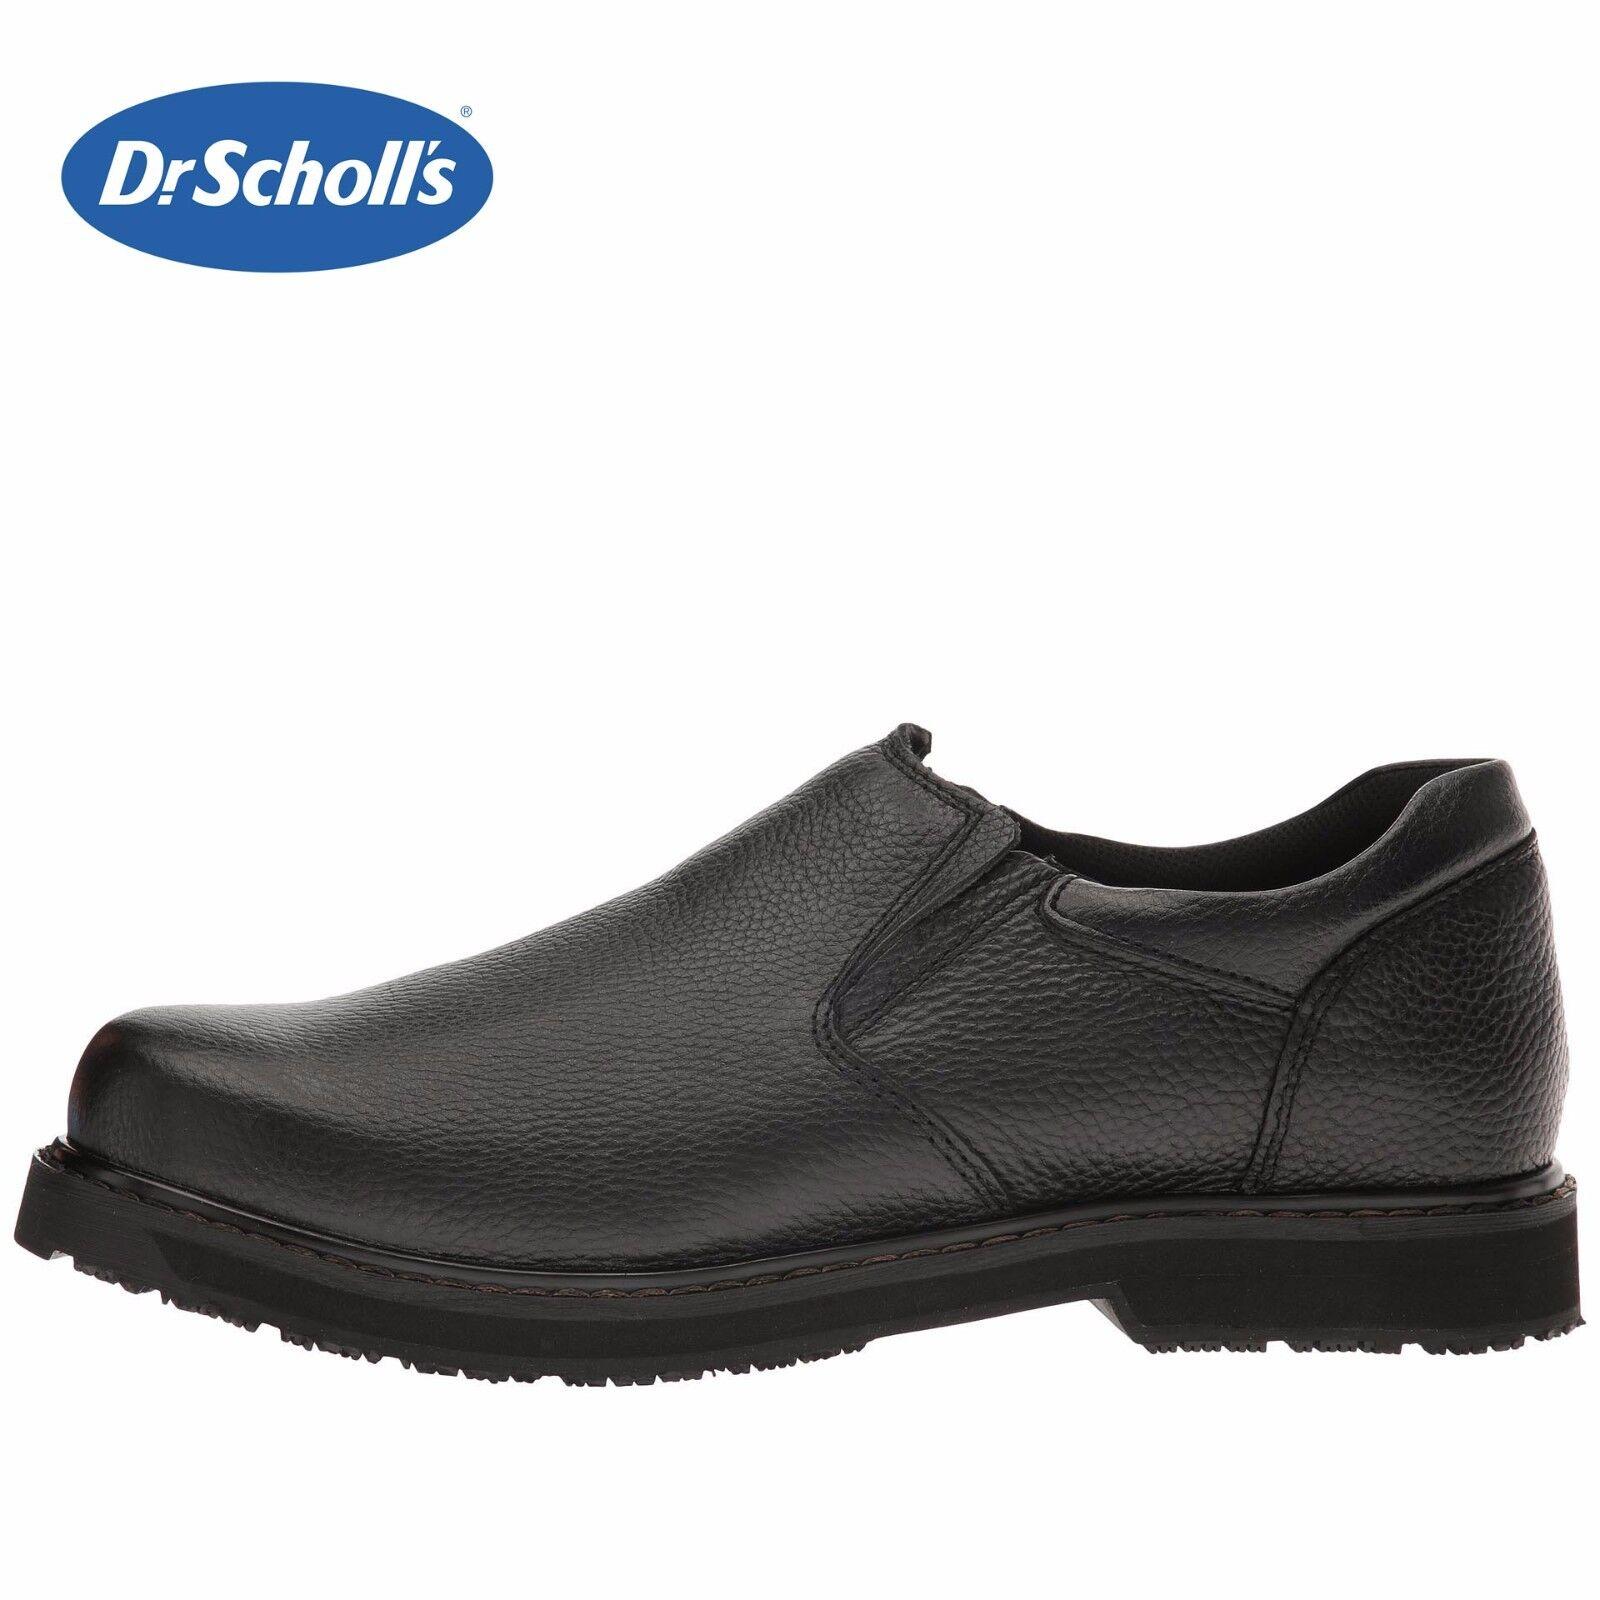 Mens Dr. Scholl's Winder II Work Loafer Memory Foam BLK Leather Slip-Resist NIB